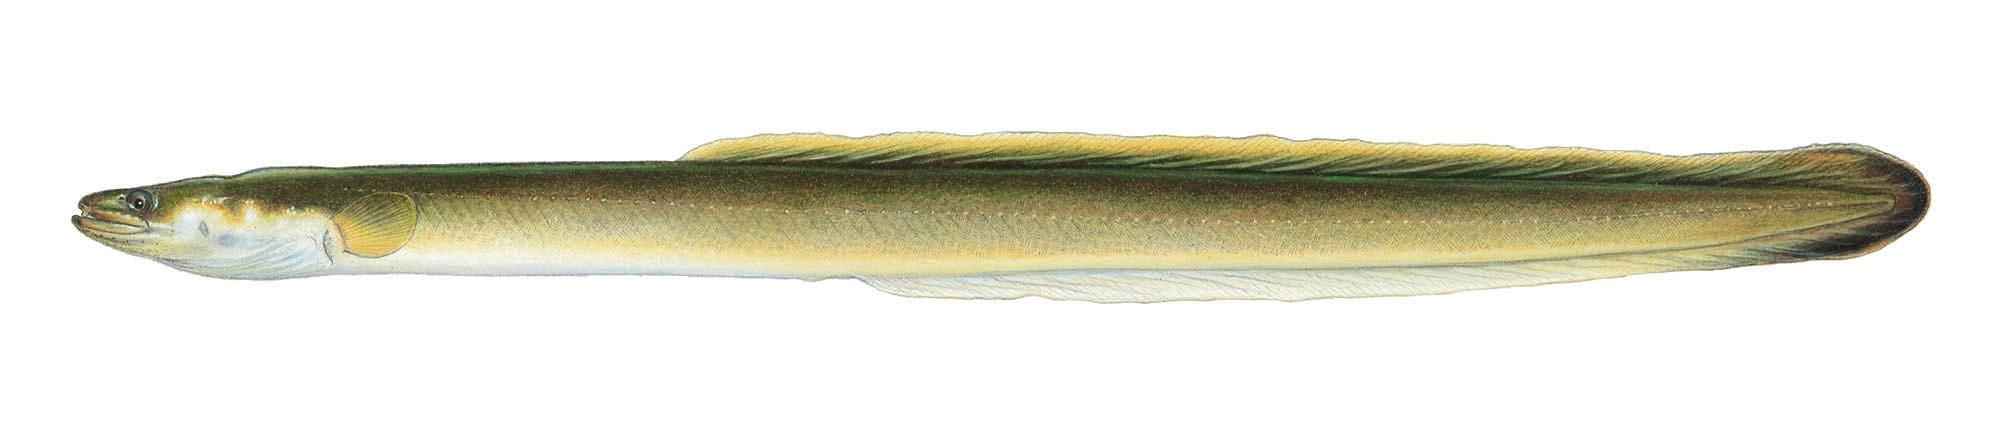 American Eel - copyright Joe Tomelleri